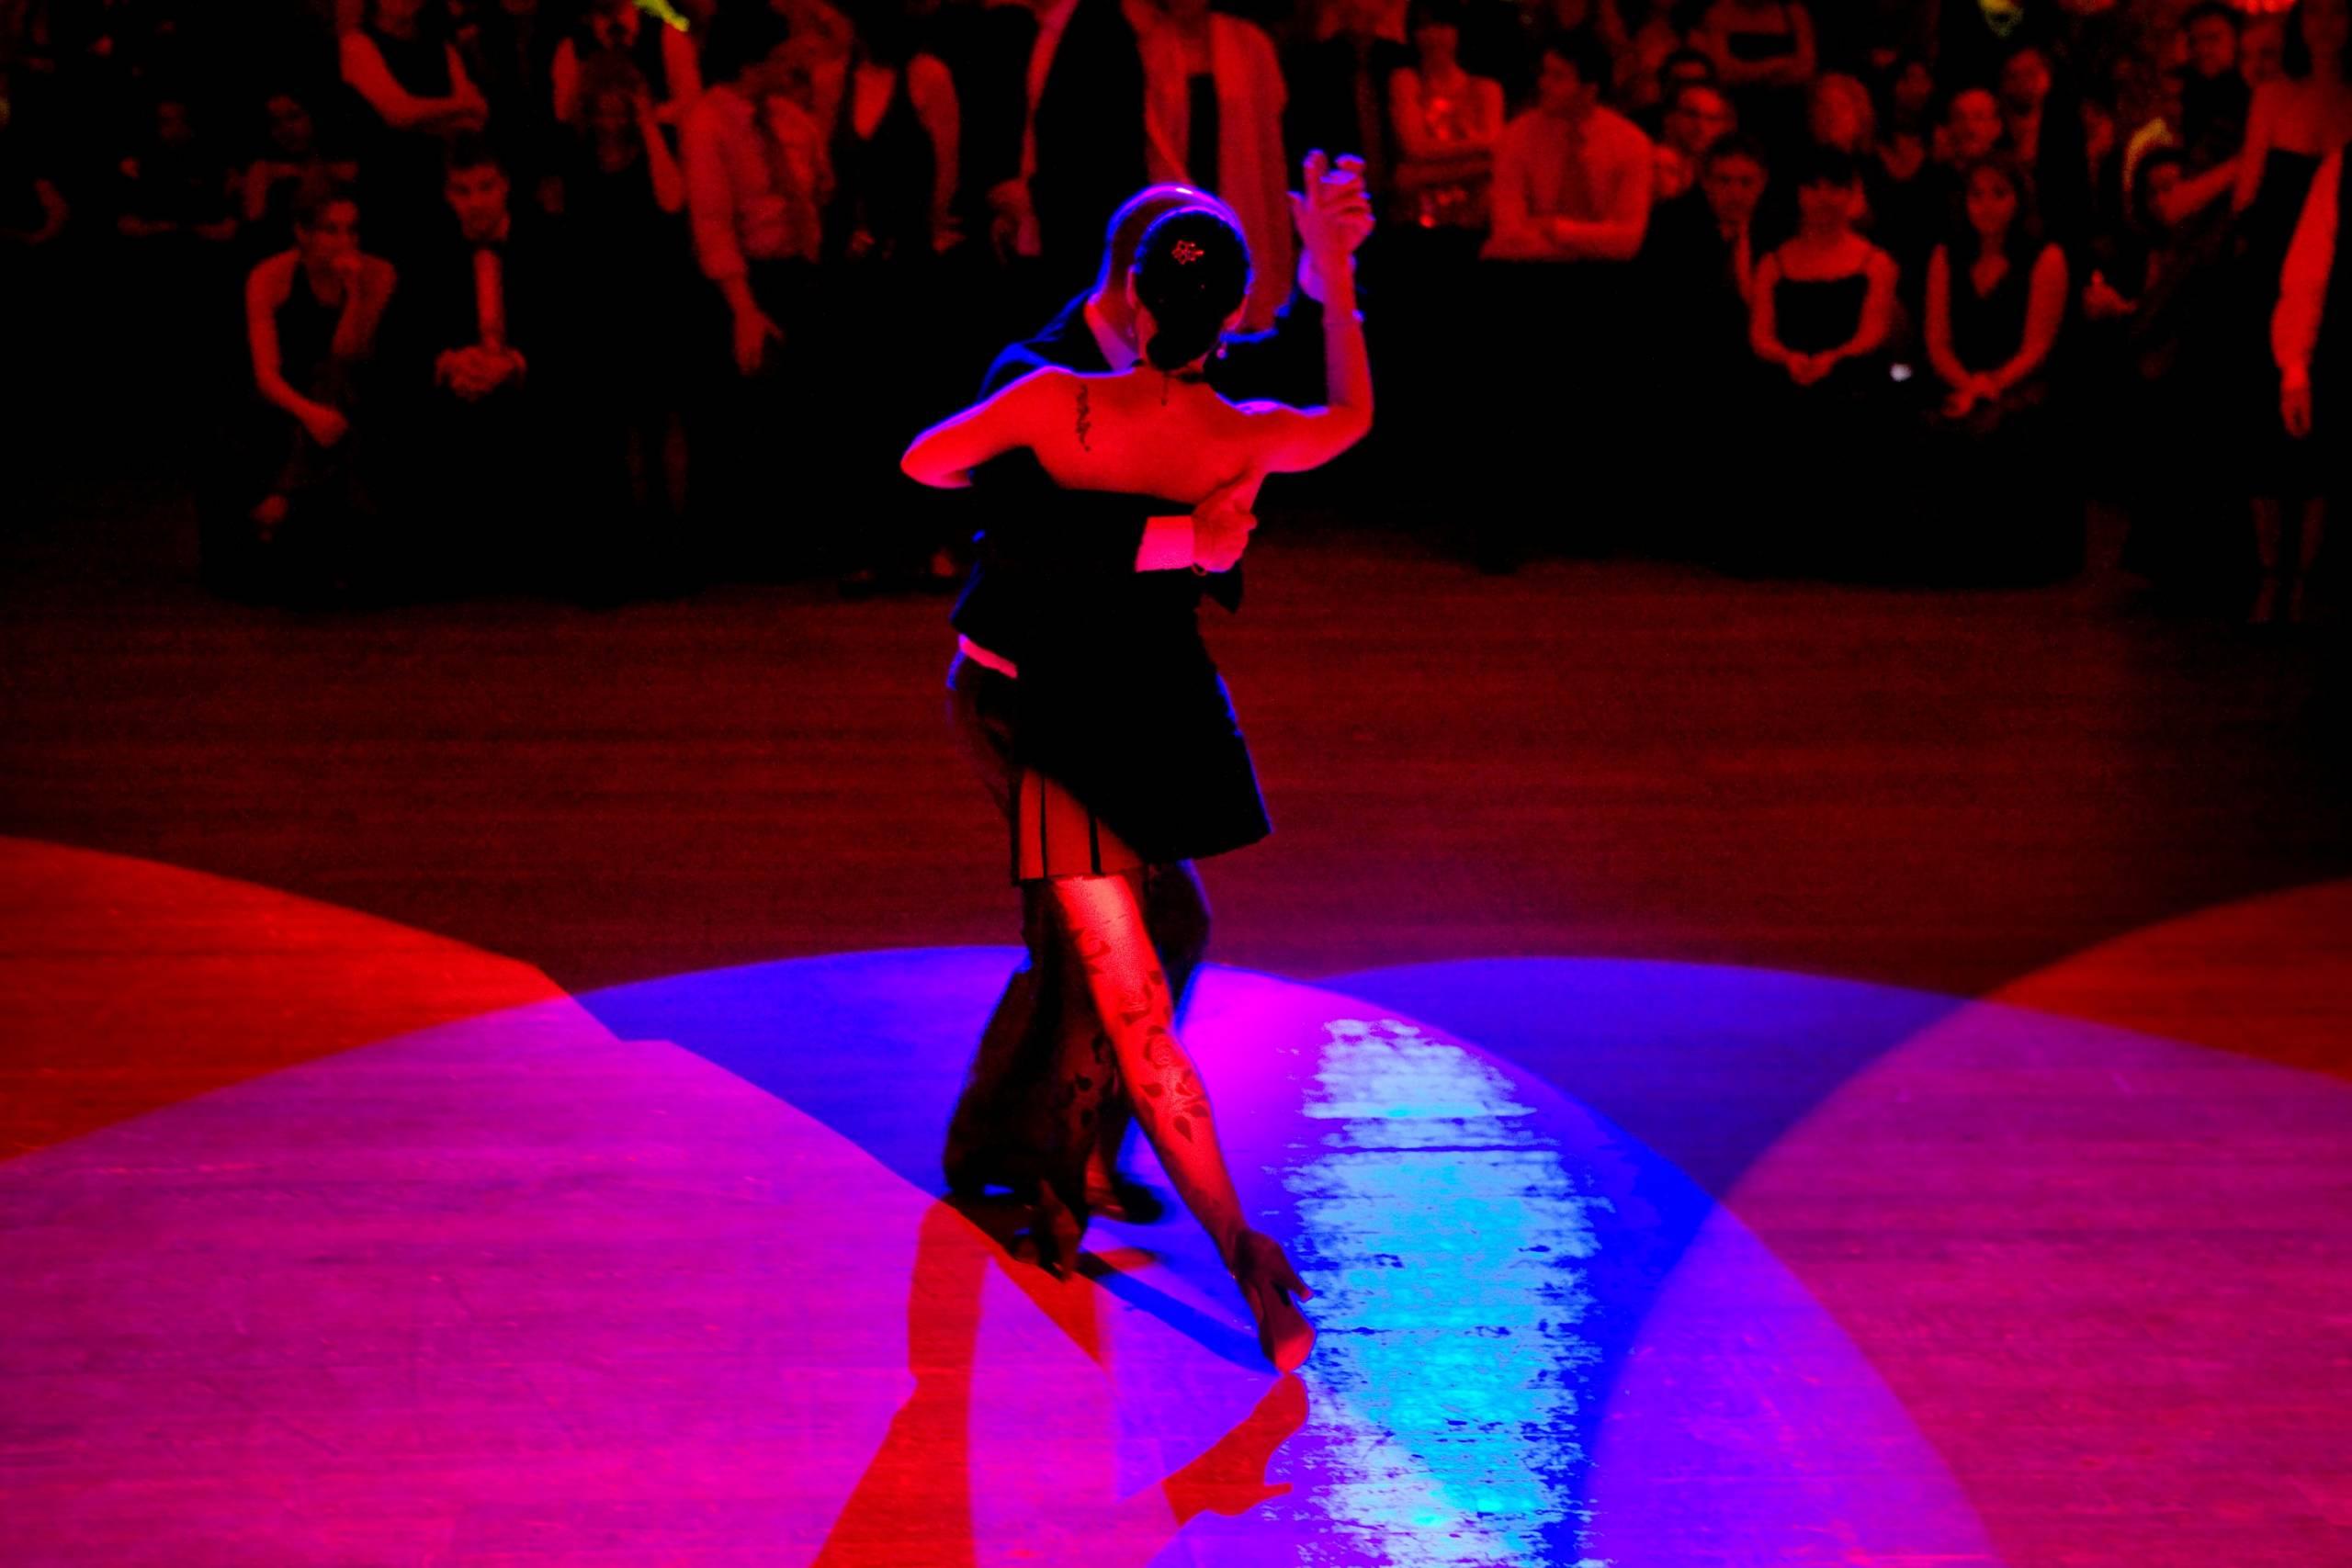 https://www.rogaia.de/files/redaktion/rogaia/bilder/kurse/tangokurs/Patrizia%20Michael%20Kronthaler/PatriziaMichael1.jpg